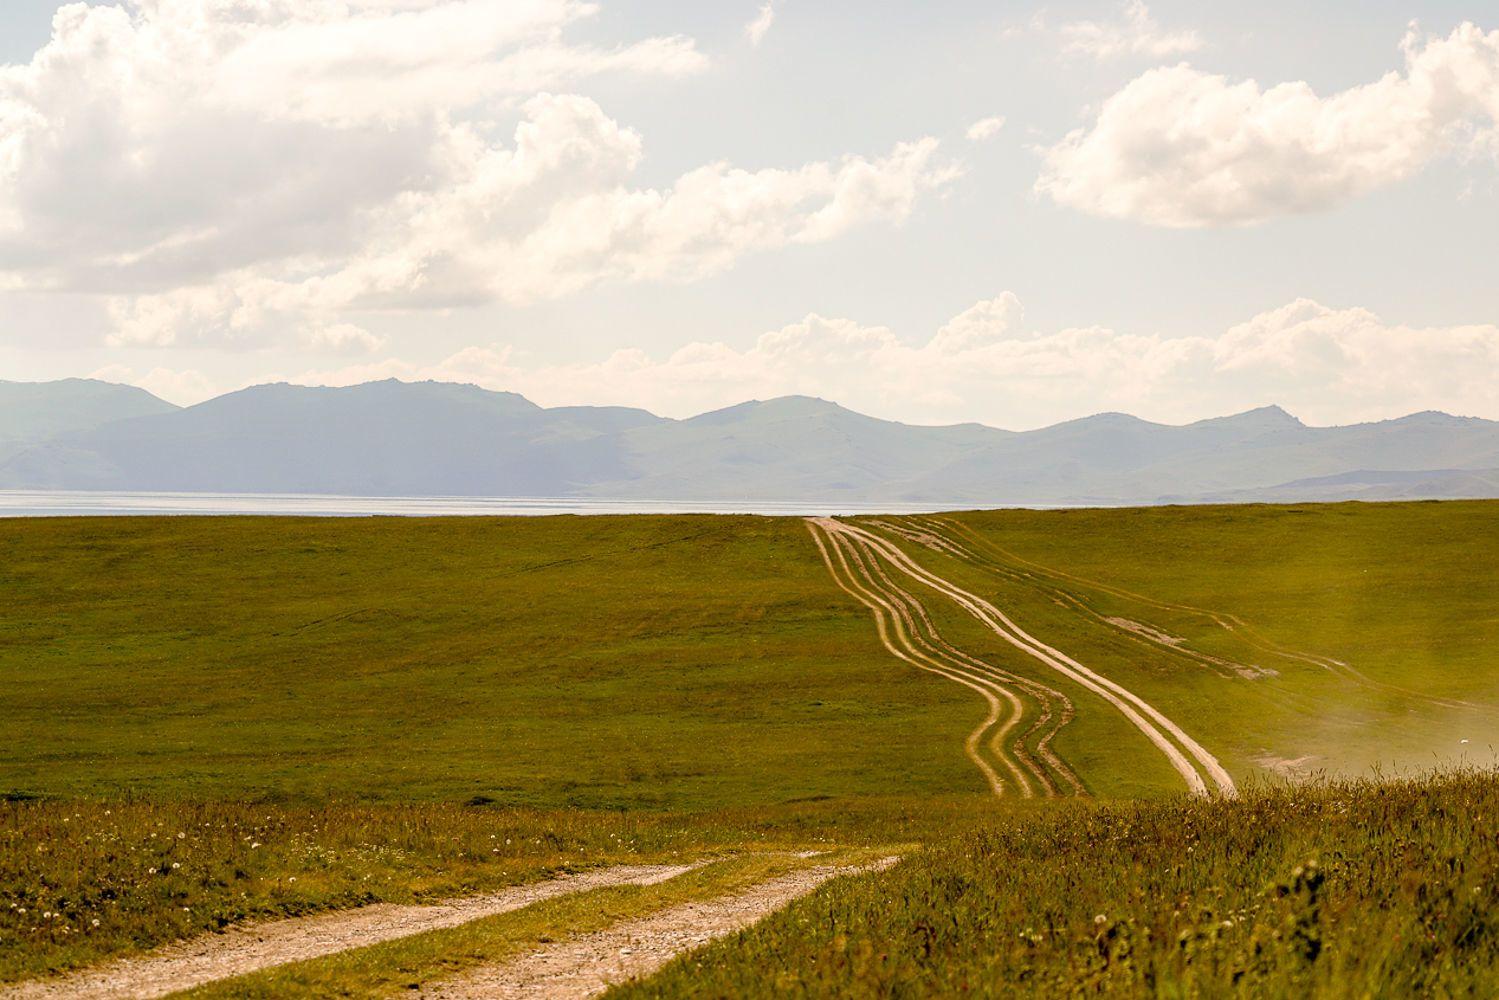 Kyrgyzstan scenery